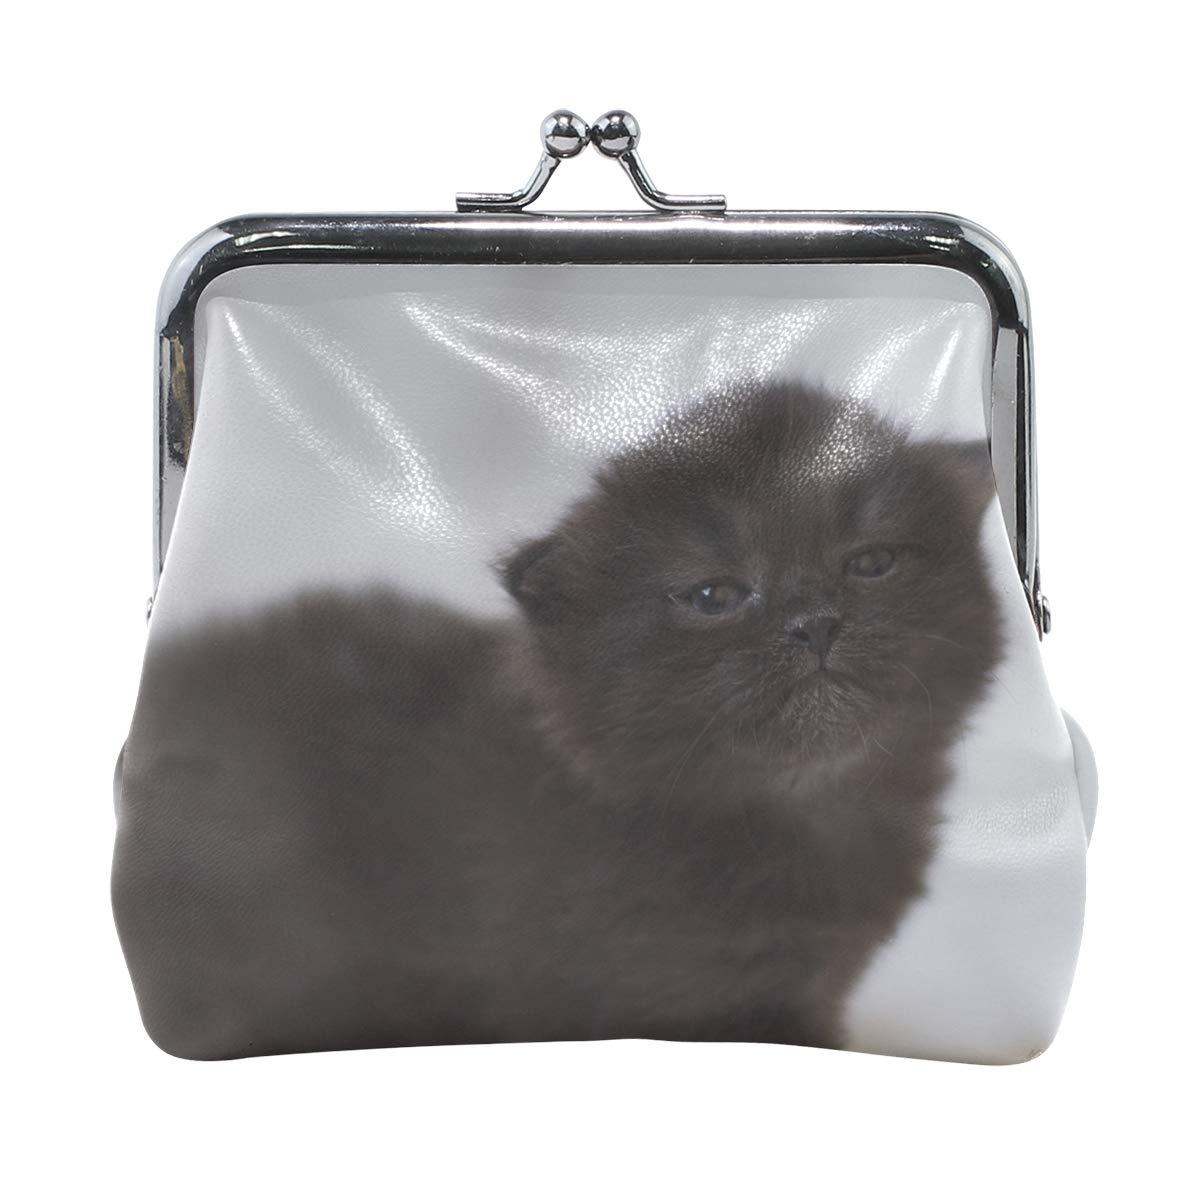 Rh Studio Coin Purse Kitten Black Photo Shoot Baby Print Wallet Exquisite Clasp Coin Purse Girls Women Clutch Handbag